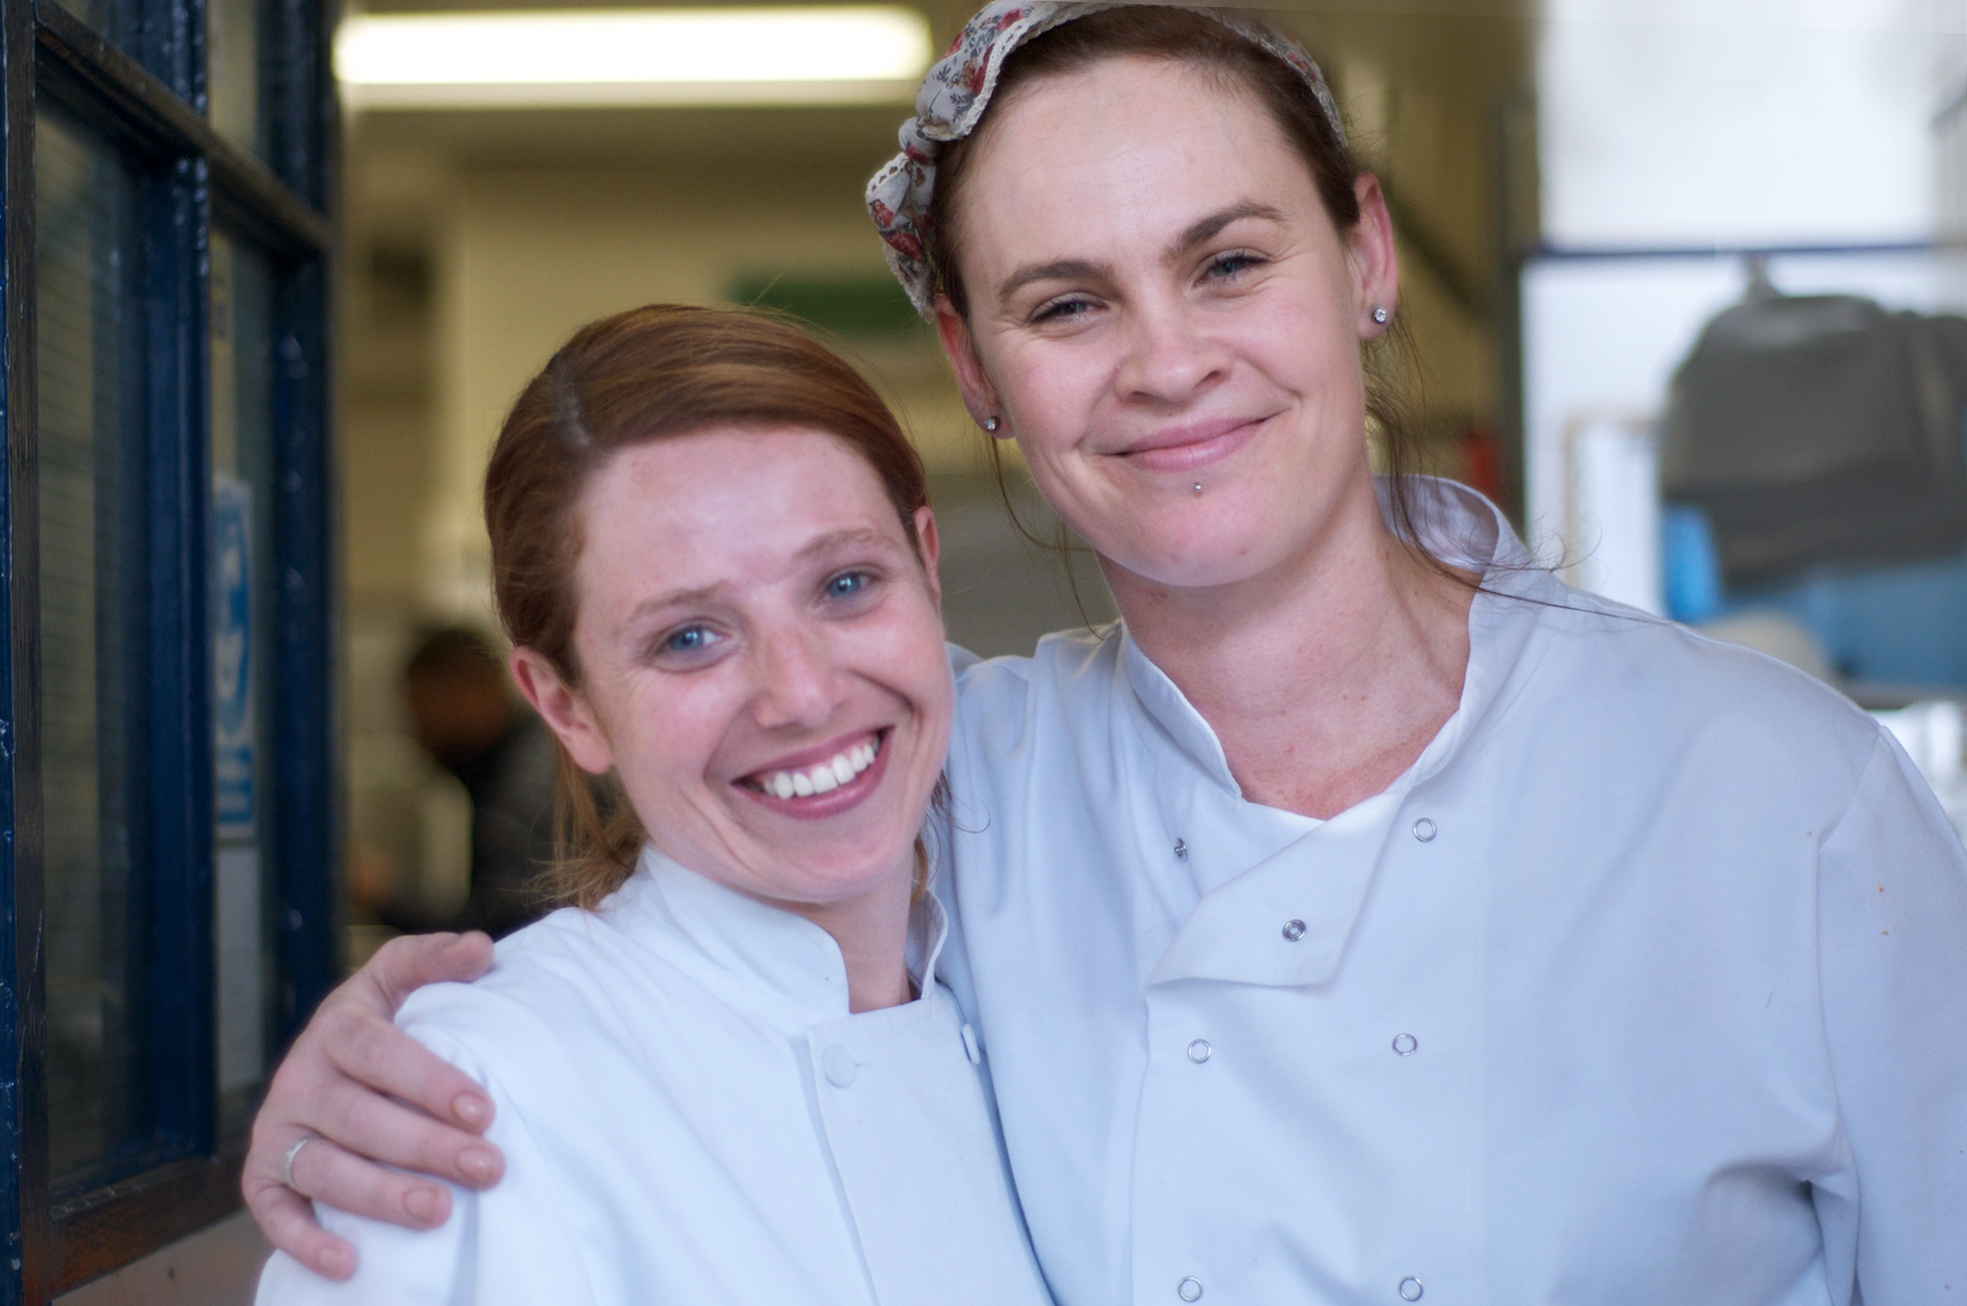 Nicole (left) and Chery-lynn